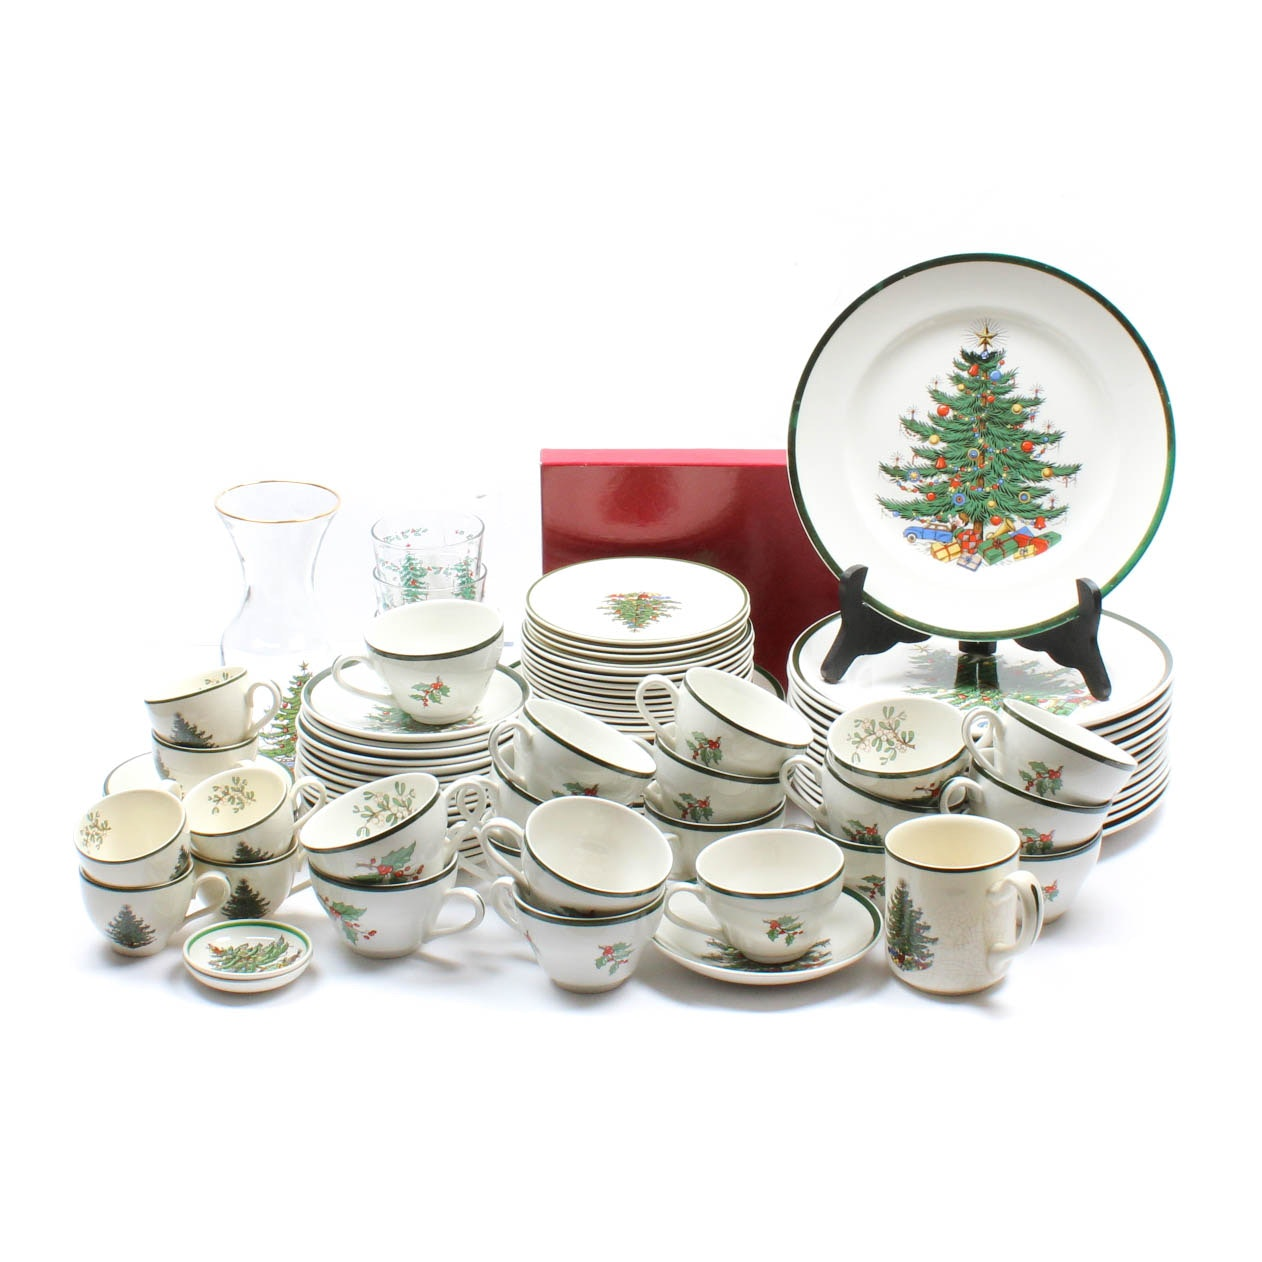 Cuthbertson  Original Christmas Tree  Porcelain Tableware ...  sc 1 st  EBTH.com & Cuthbertson